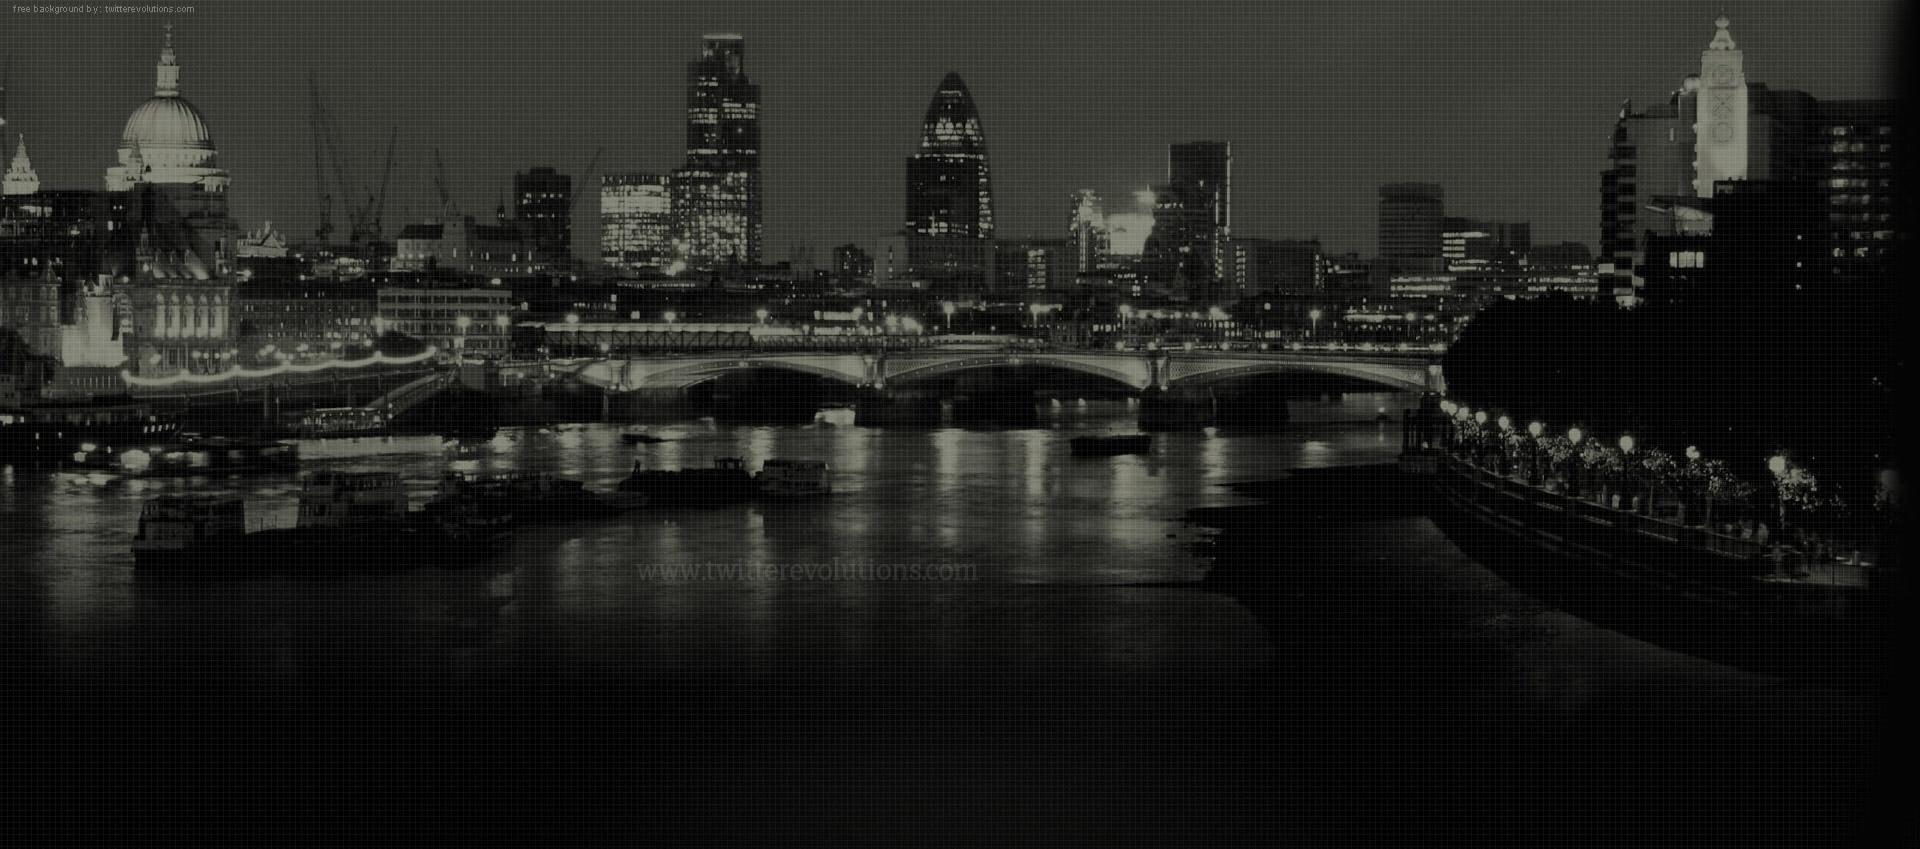 New York City Twitter Backgrounds - WallpaperSafari